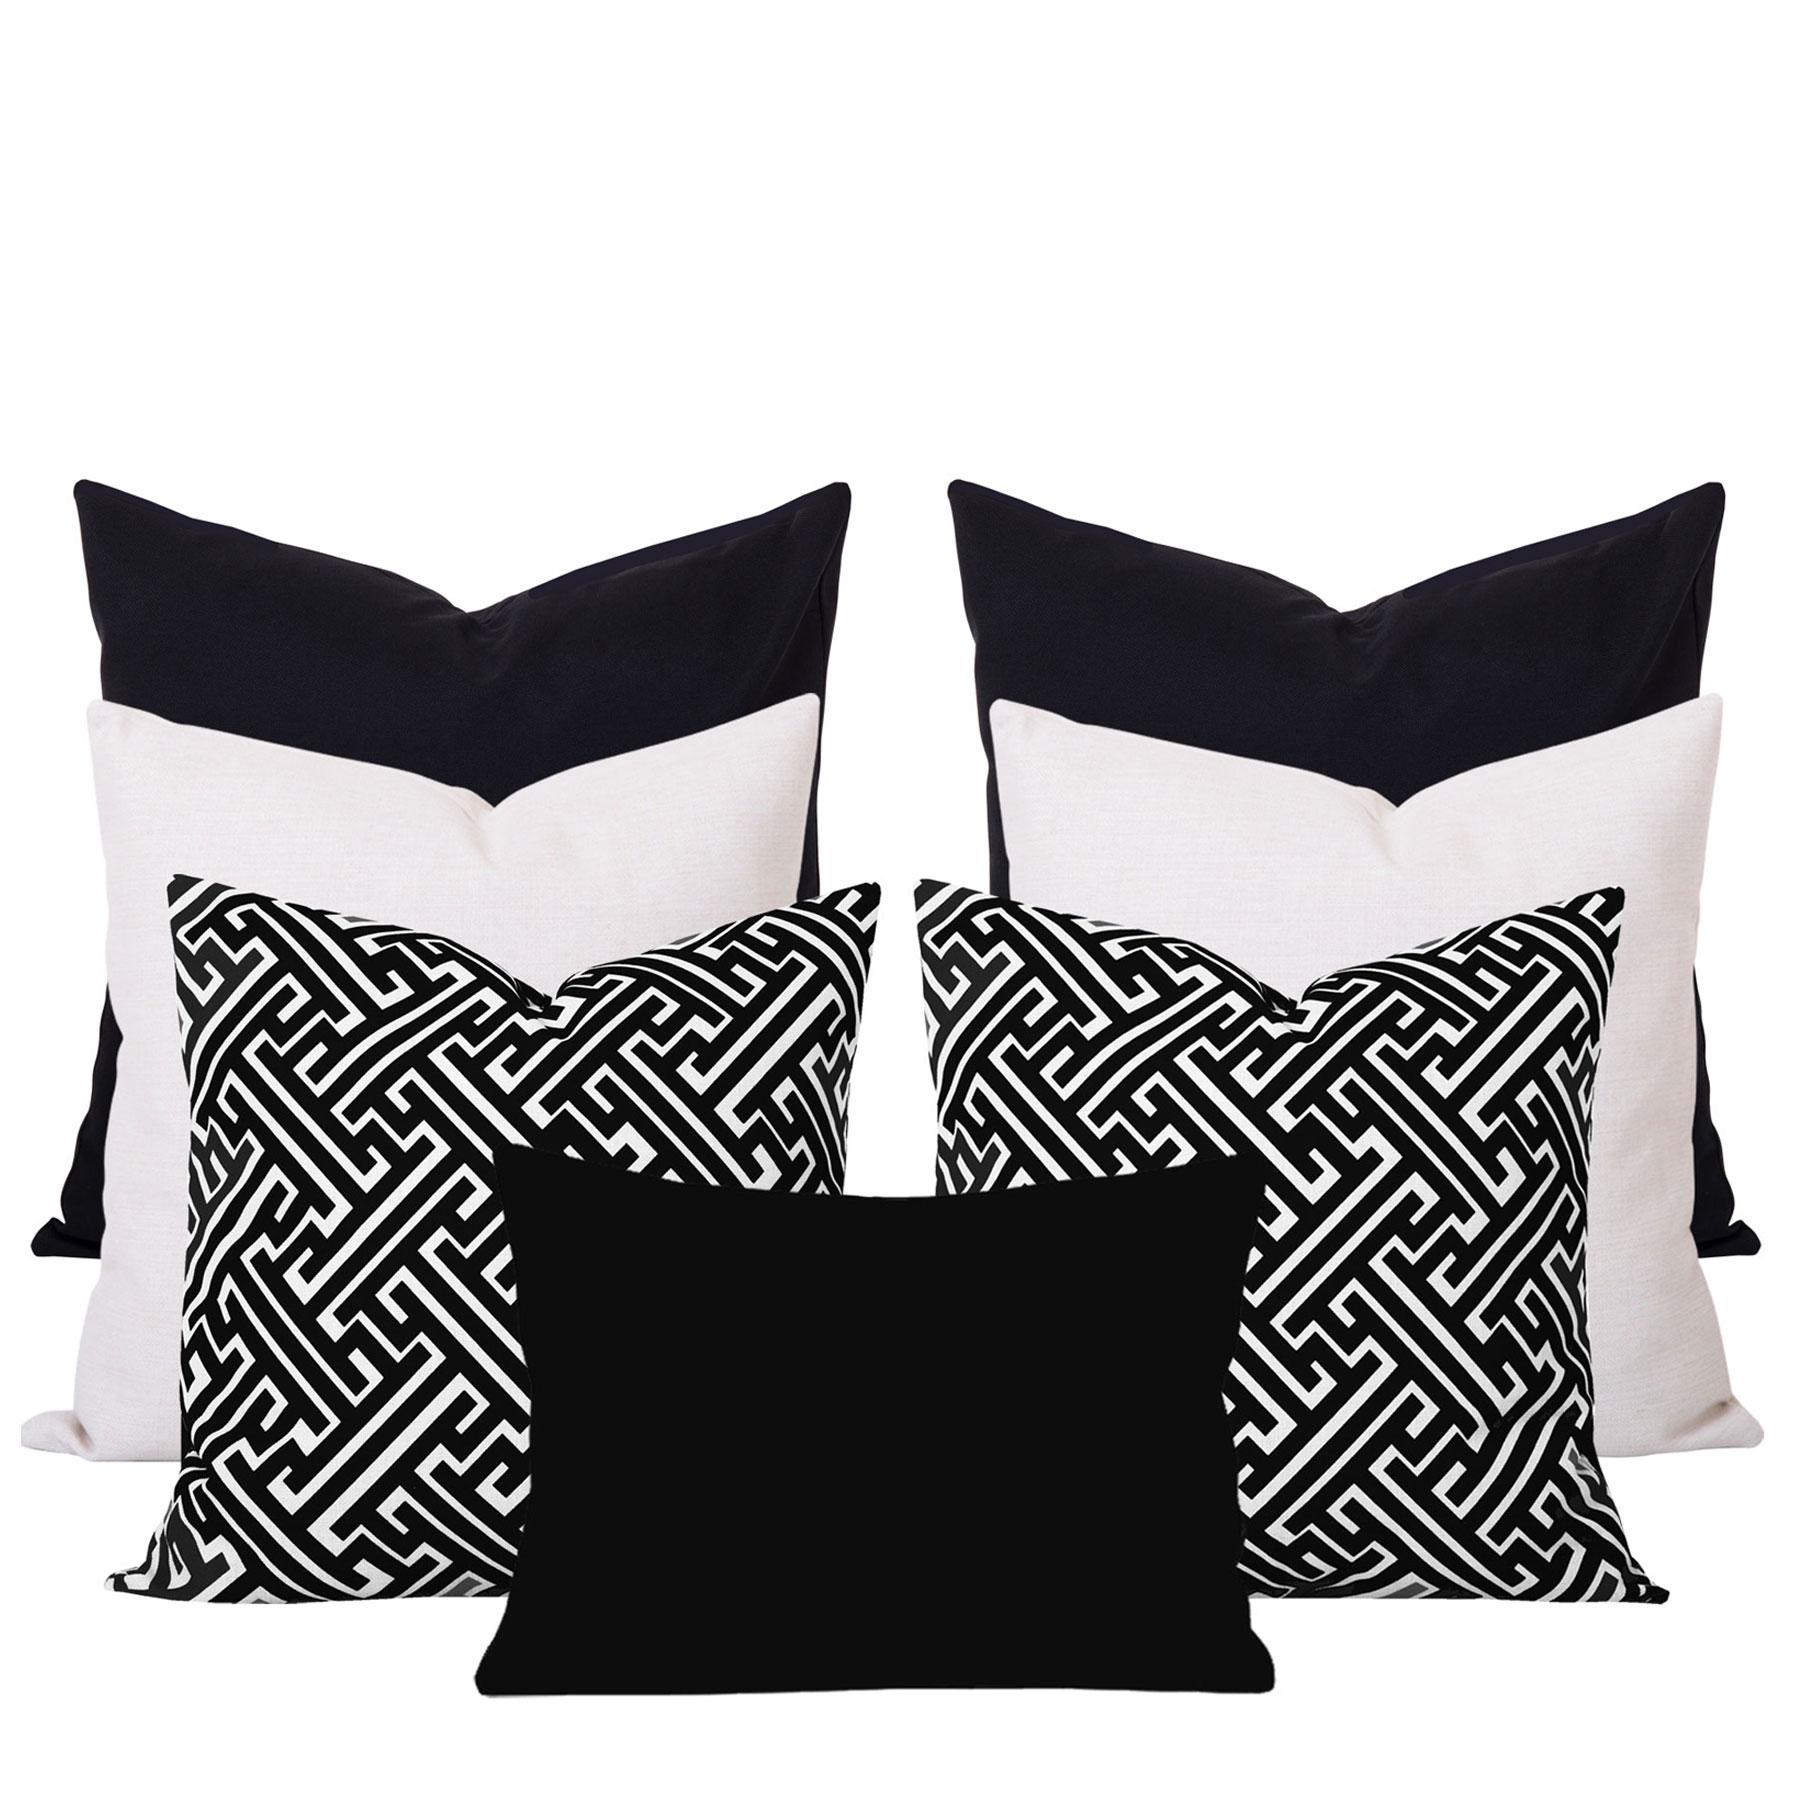 Georgia-Maze-Black-7-Cushion-Set6